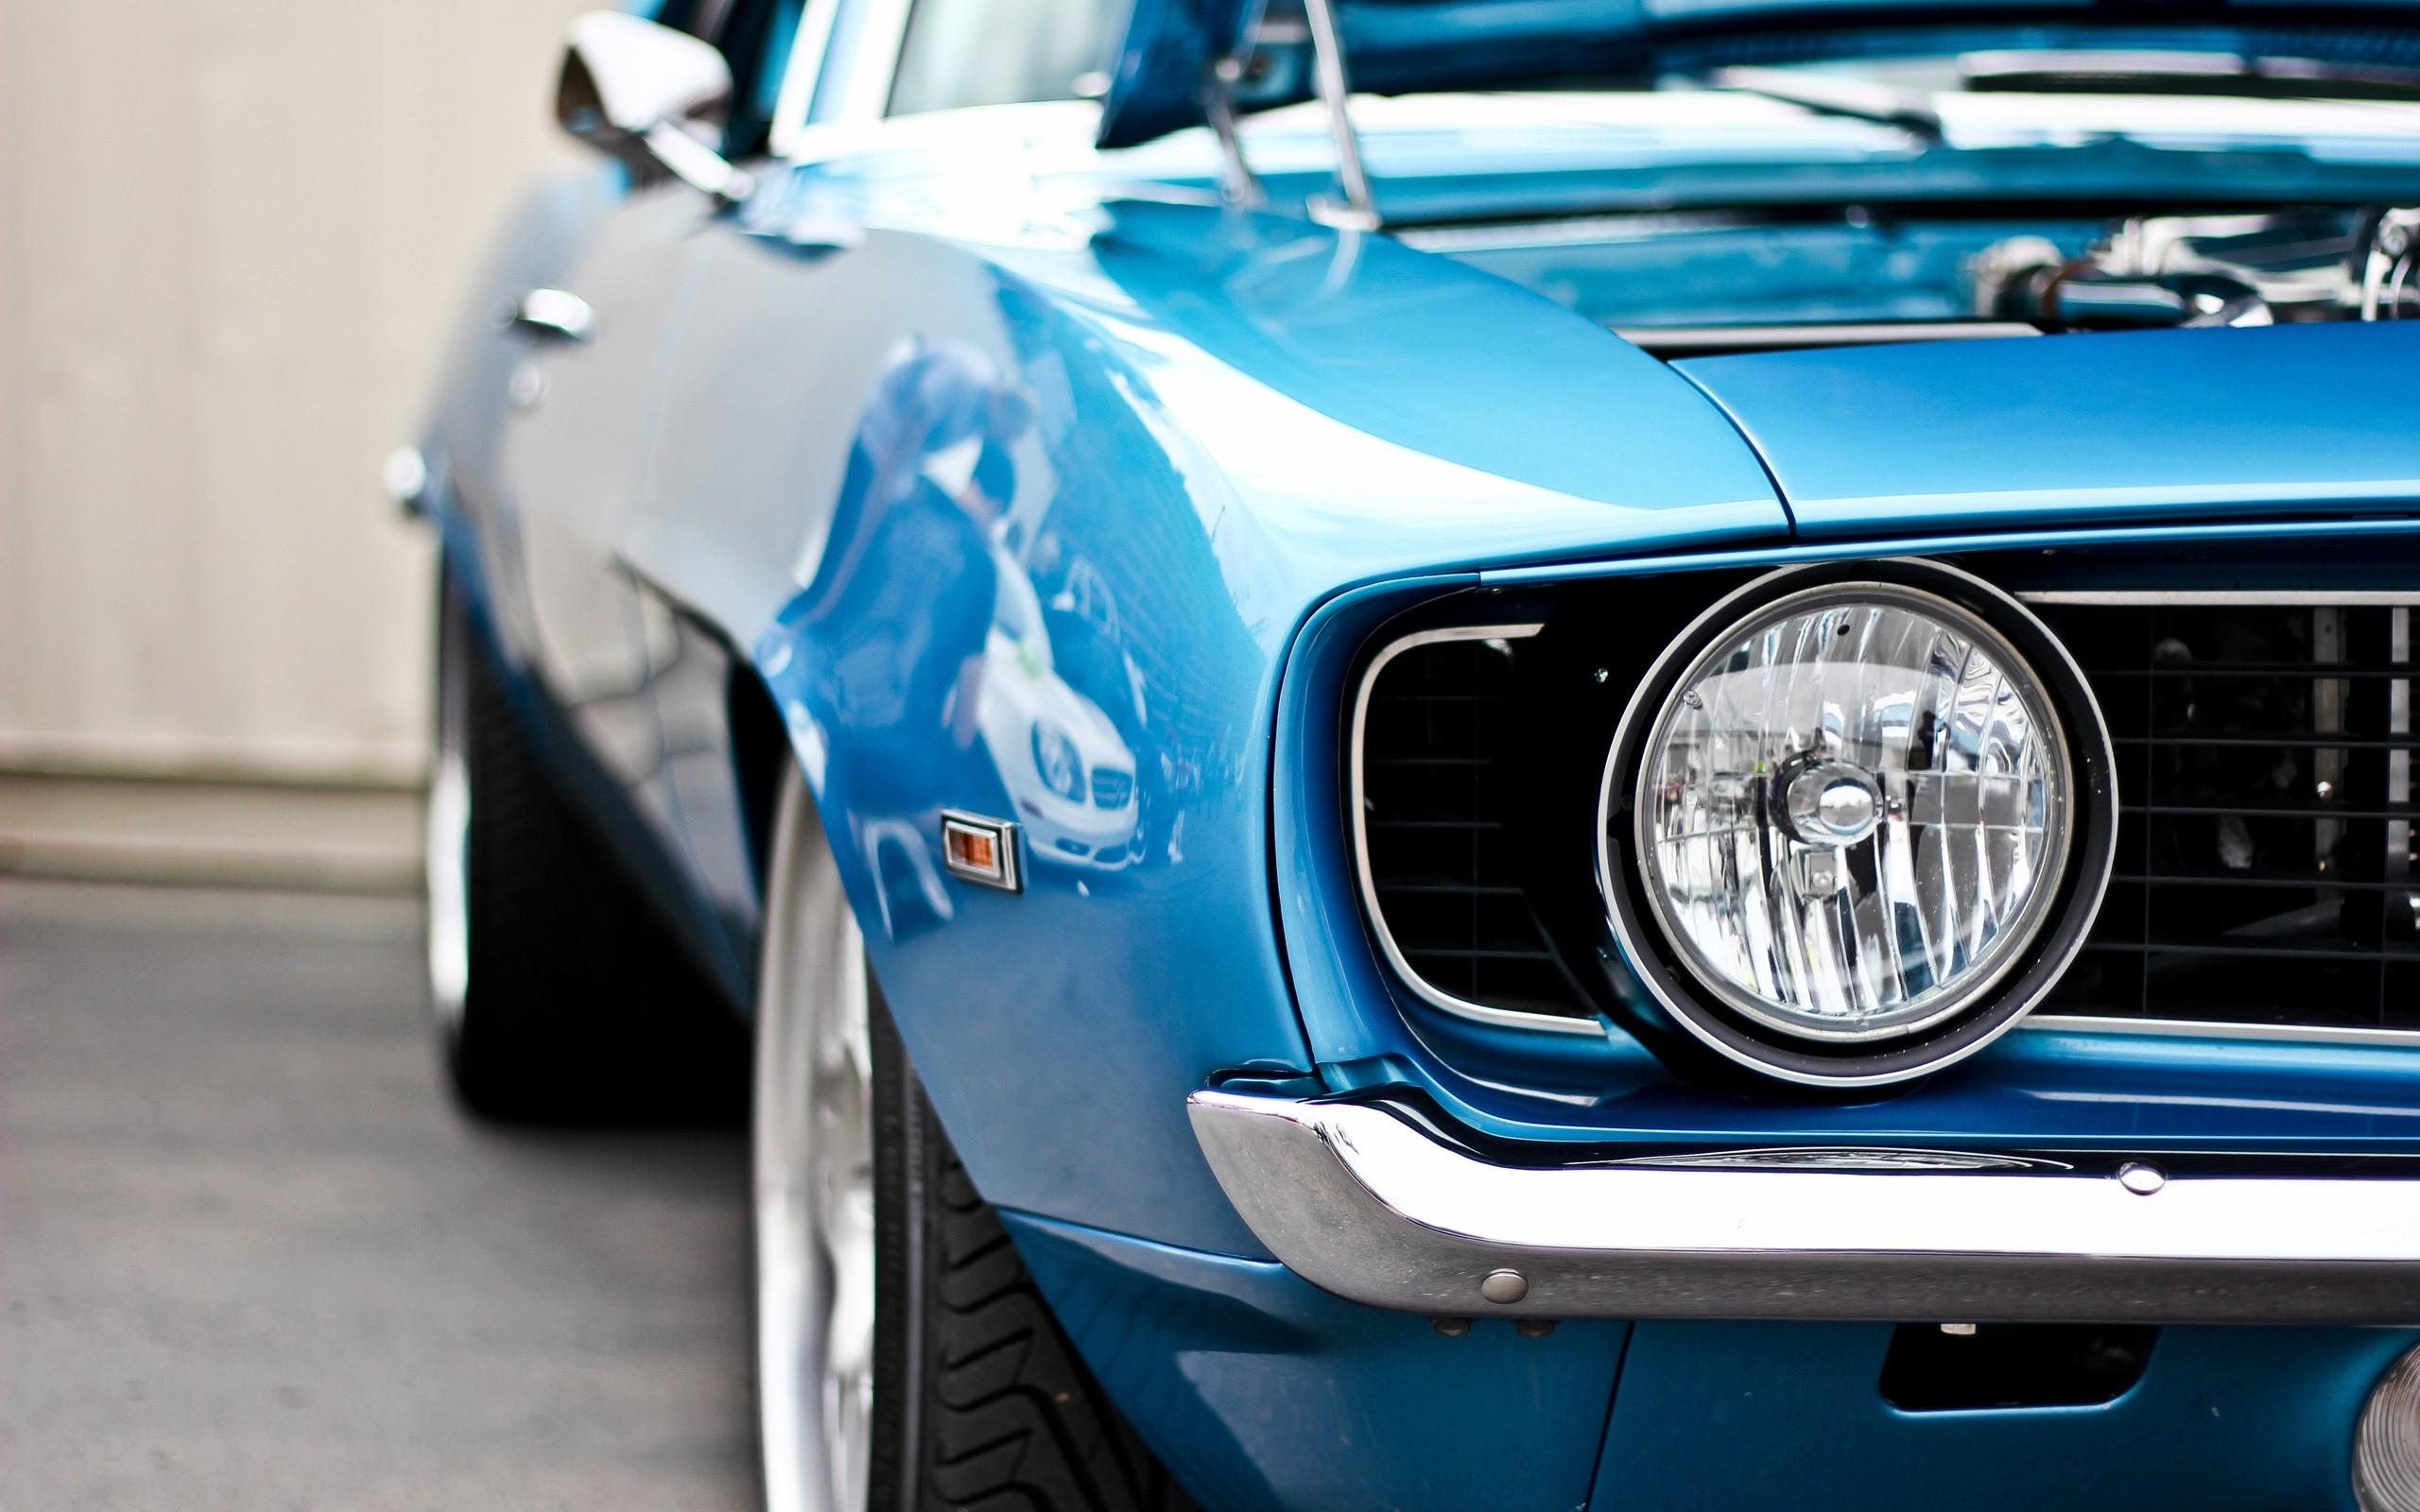 Ford Mustang Muscle Car Wallpaper | HD Car Wallpapers